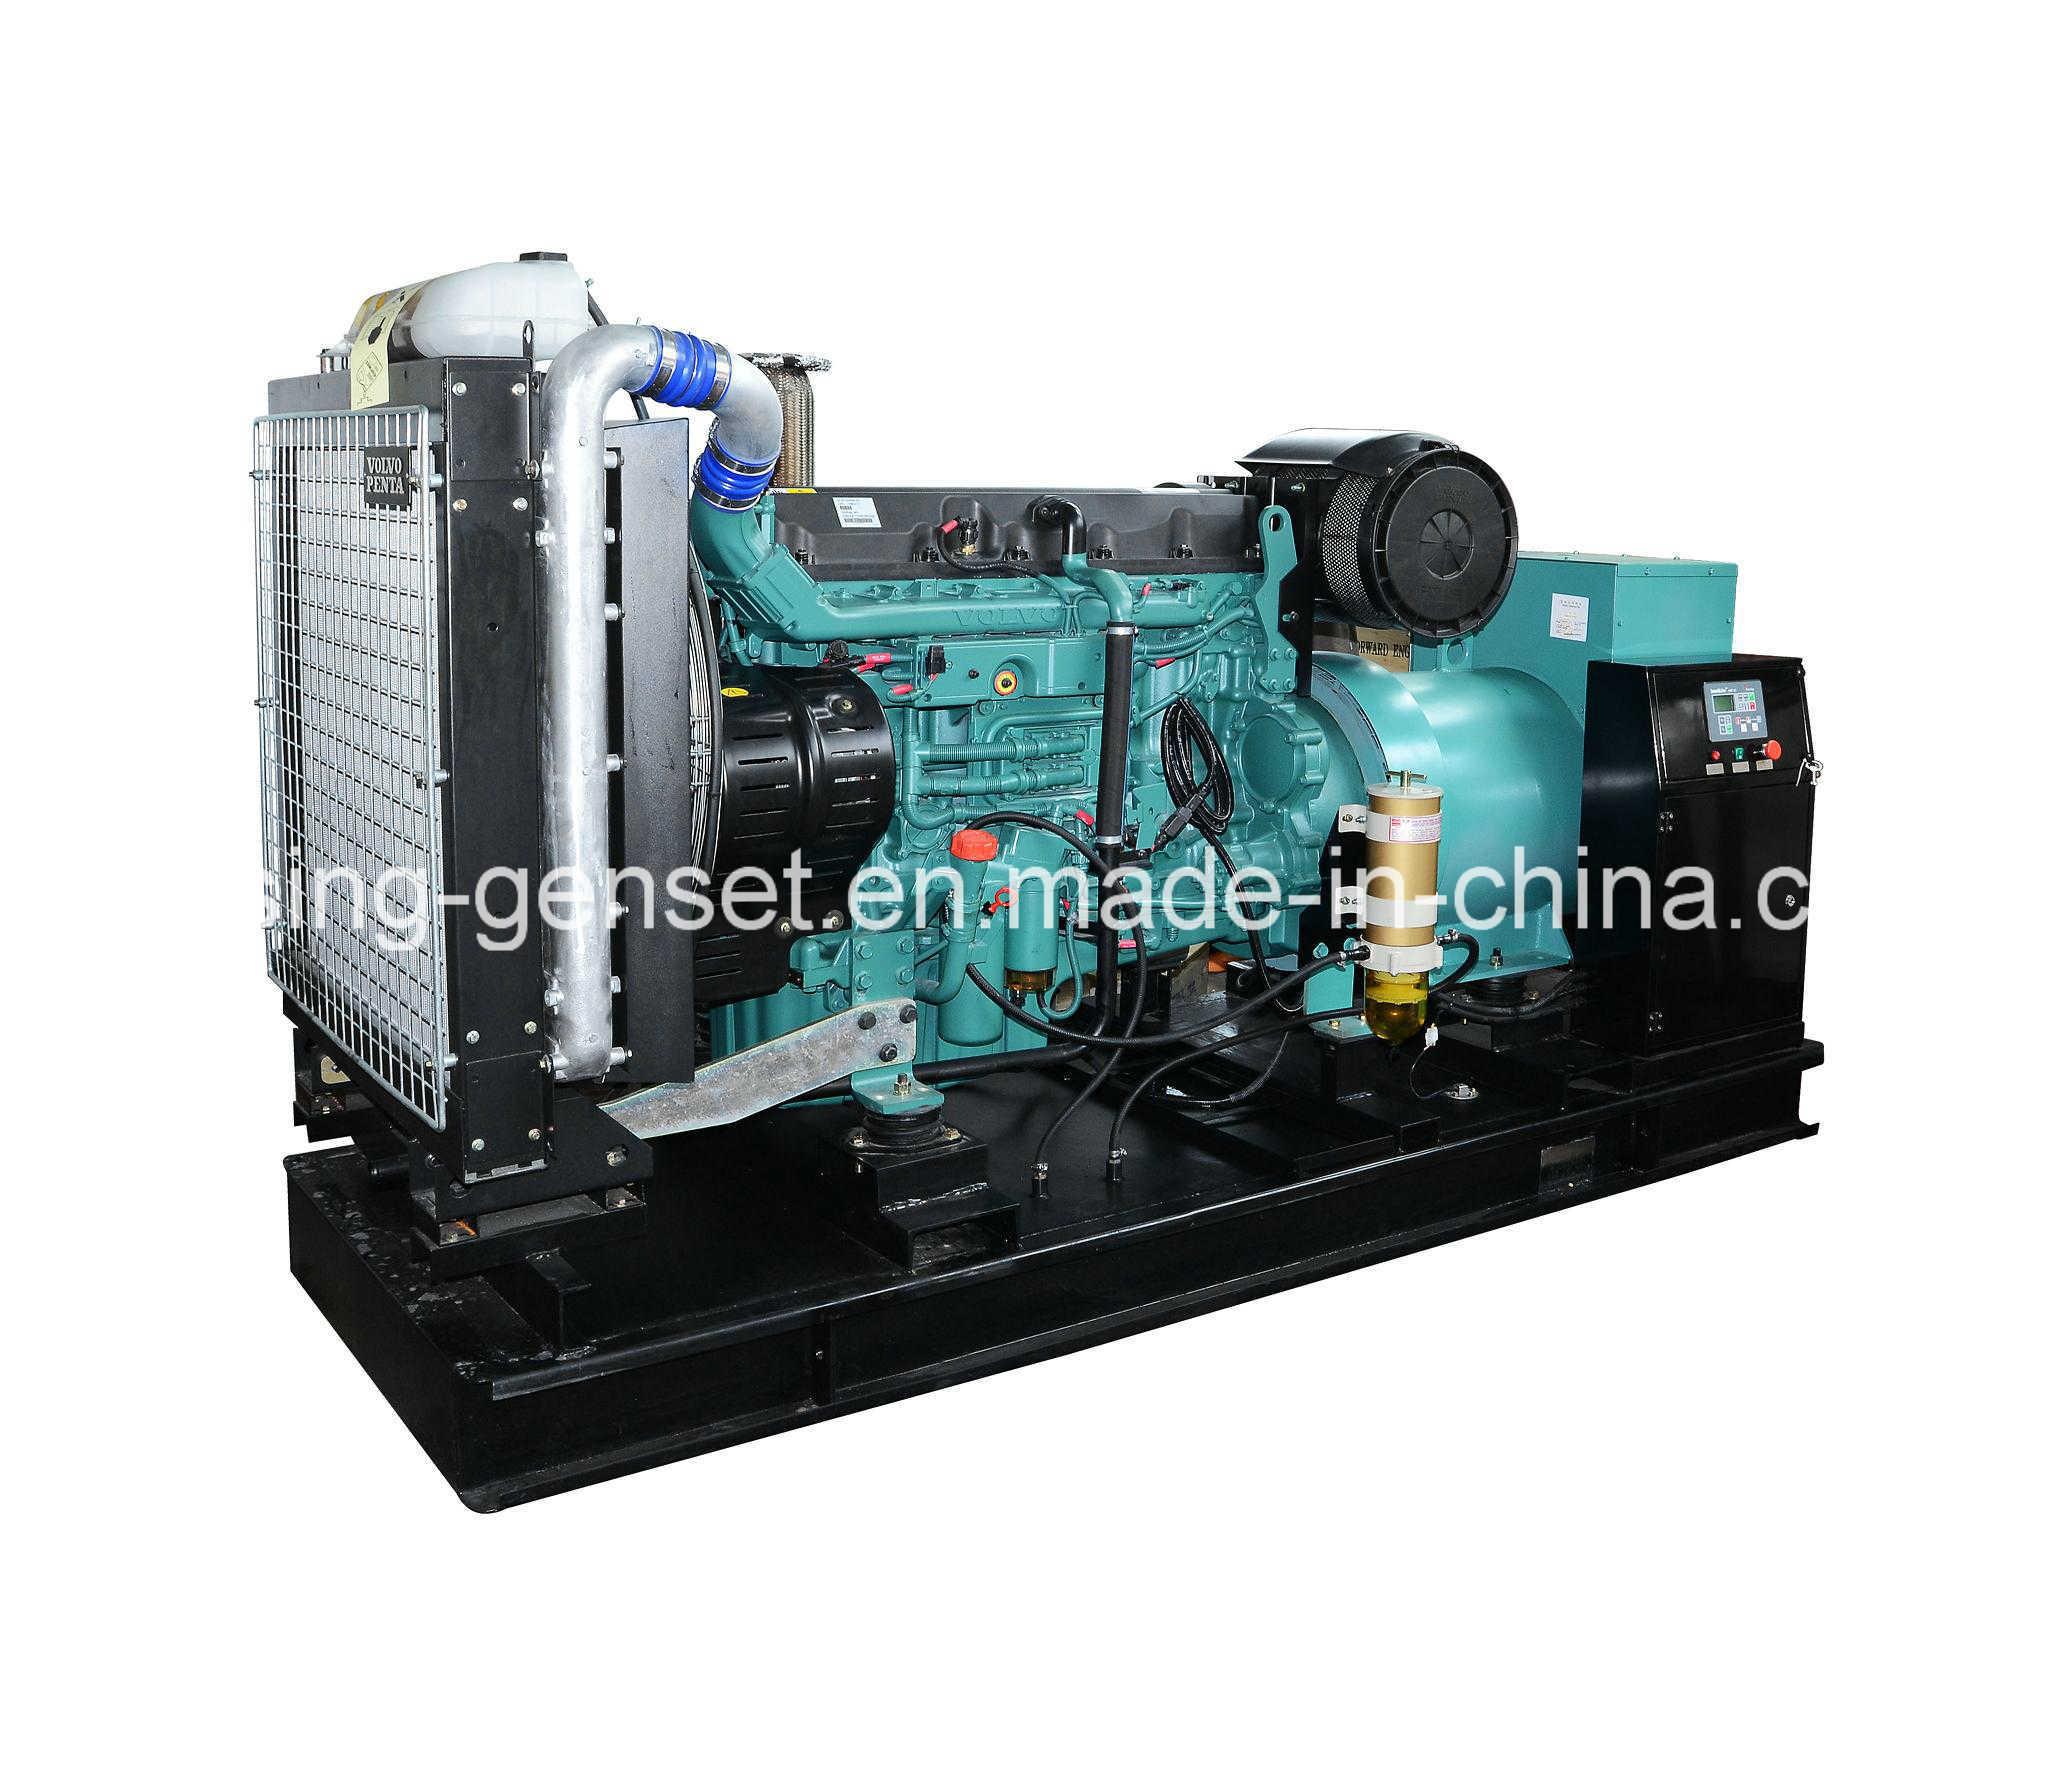 75kVA-687.5kVA Diesel Open Generator with Vovol Engine (VK5000)